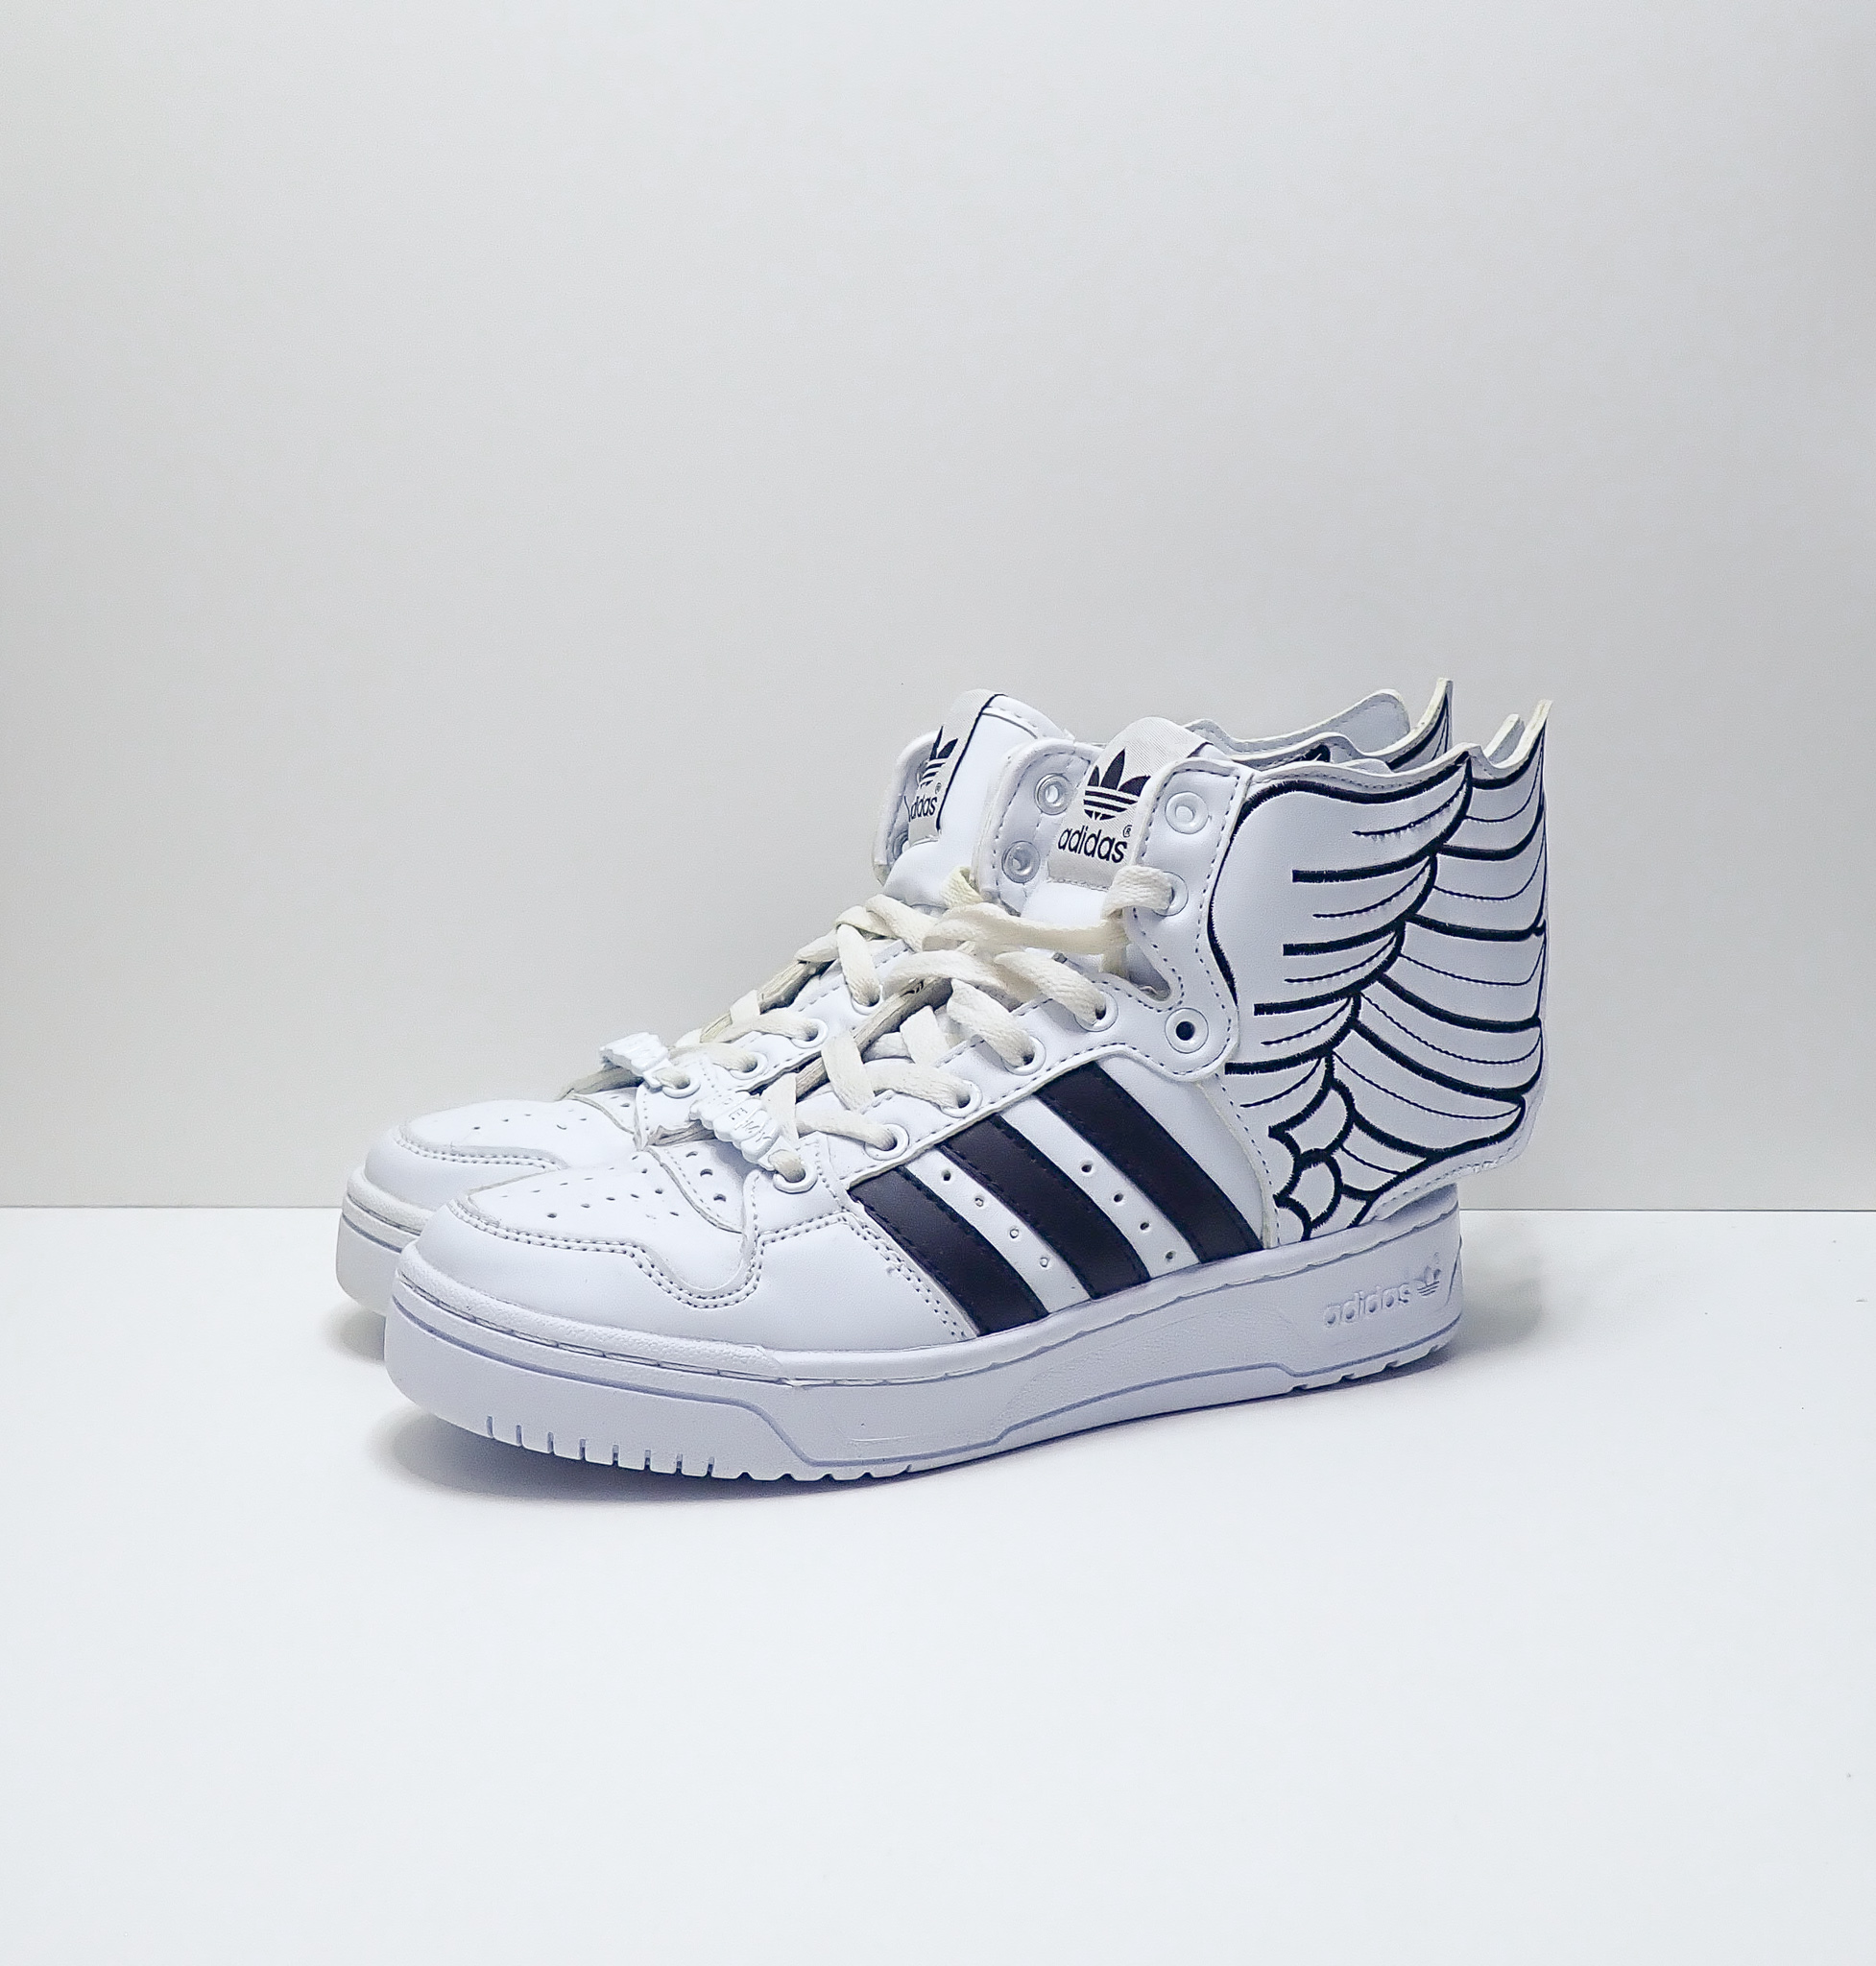 Adidas Js Wing 2.0 Jeremy Scott